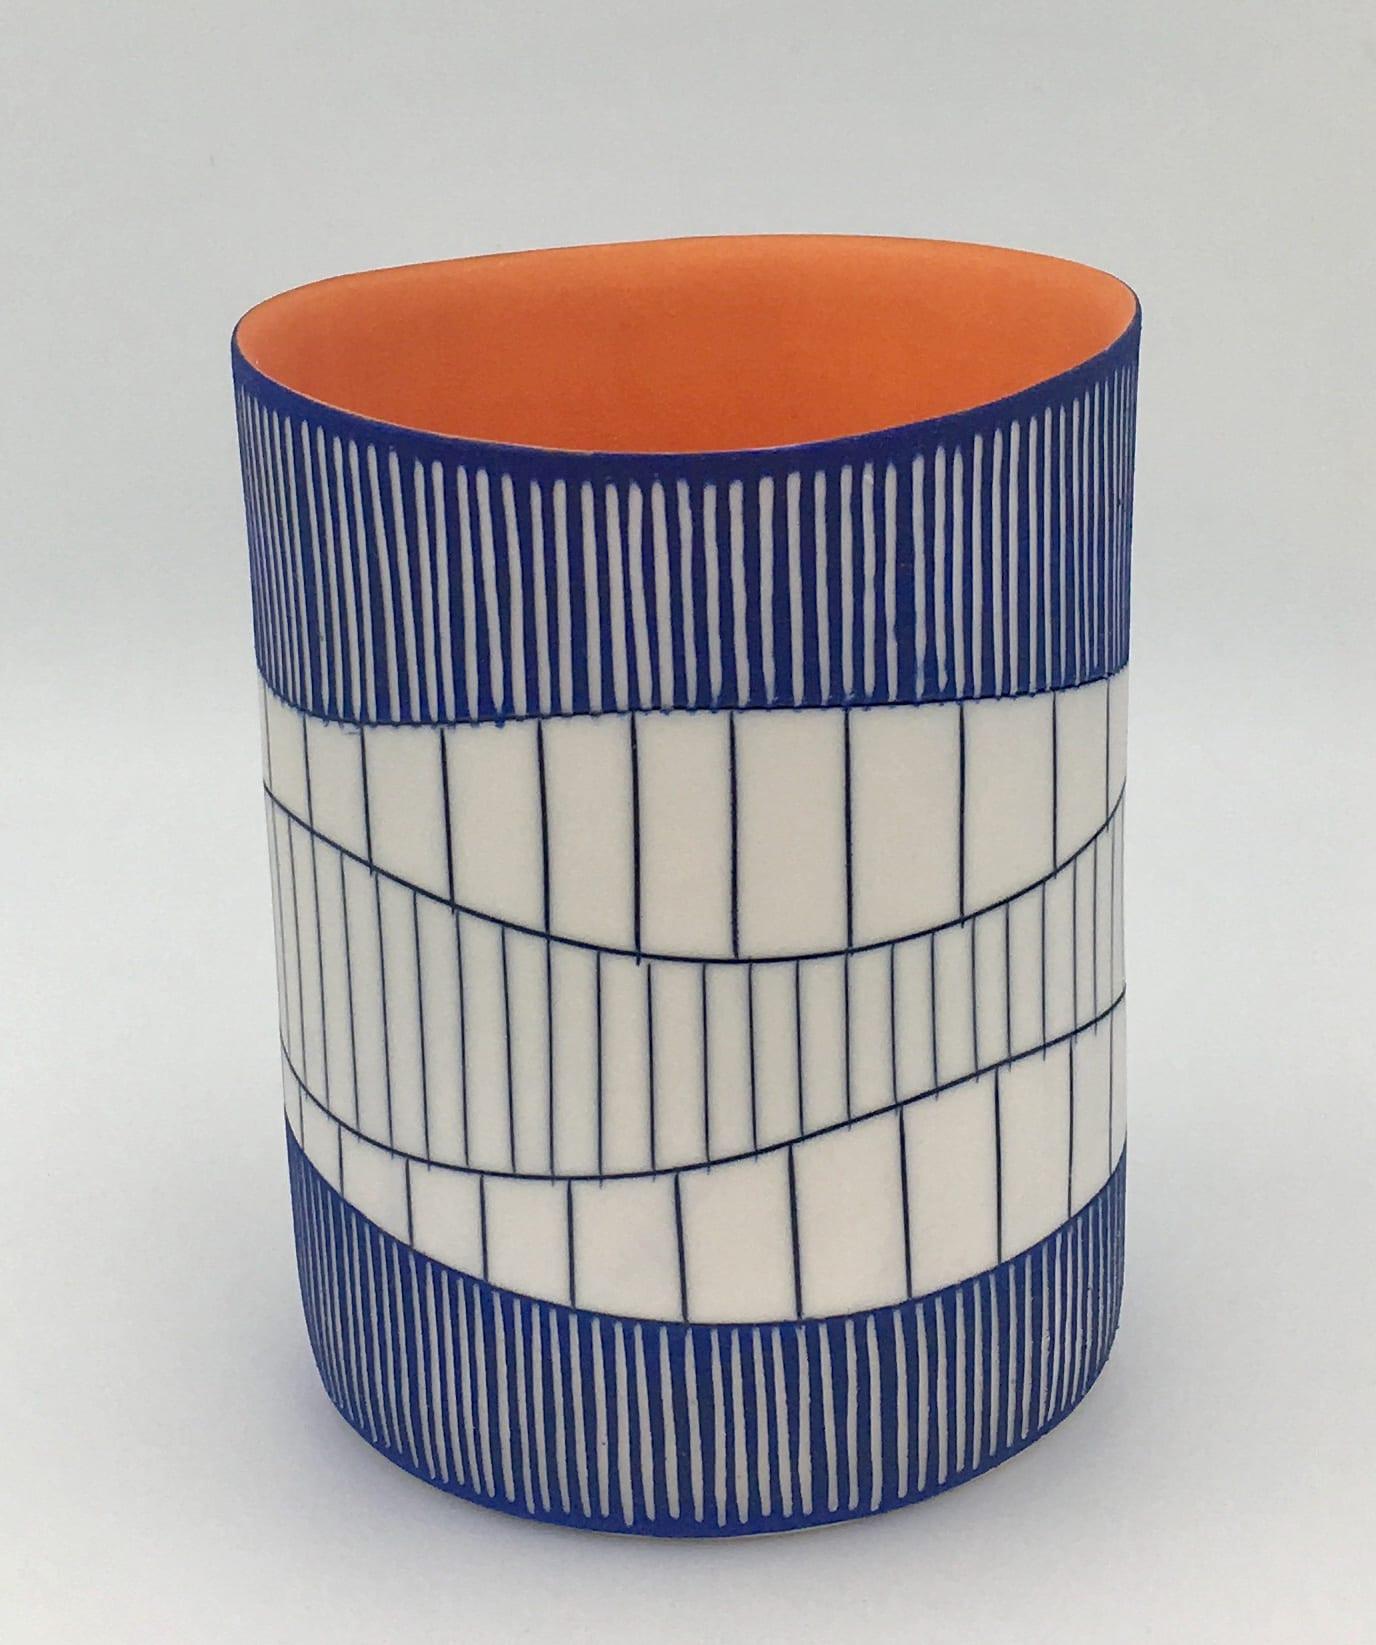 "<span class=""link fancybox-details-link""><a href=""/artists/195-lara-scobie/works/6526-lara-scobie-cylinder-vase-in-deep-blue-and-orange-2019/"">View Detail Page</a></span><div class=""artist""><strong>Lara Scobie</strong></div> b. 1967 <div class=""title""><em>Cylinder Vase in Deep Blue and Orange</em>, 2019</div> <div class=""medium"">Porcelain</div><div class=""copyright_line"">Own Art: £28 x 10 Months, 0% APR</div>"